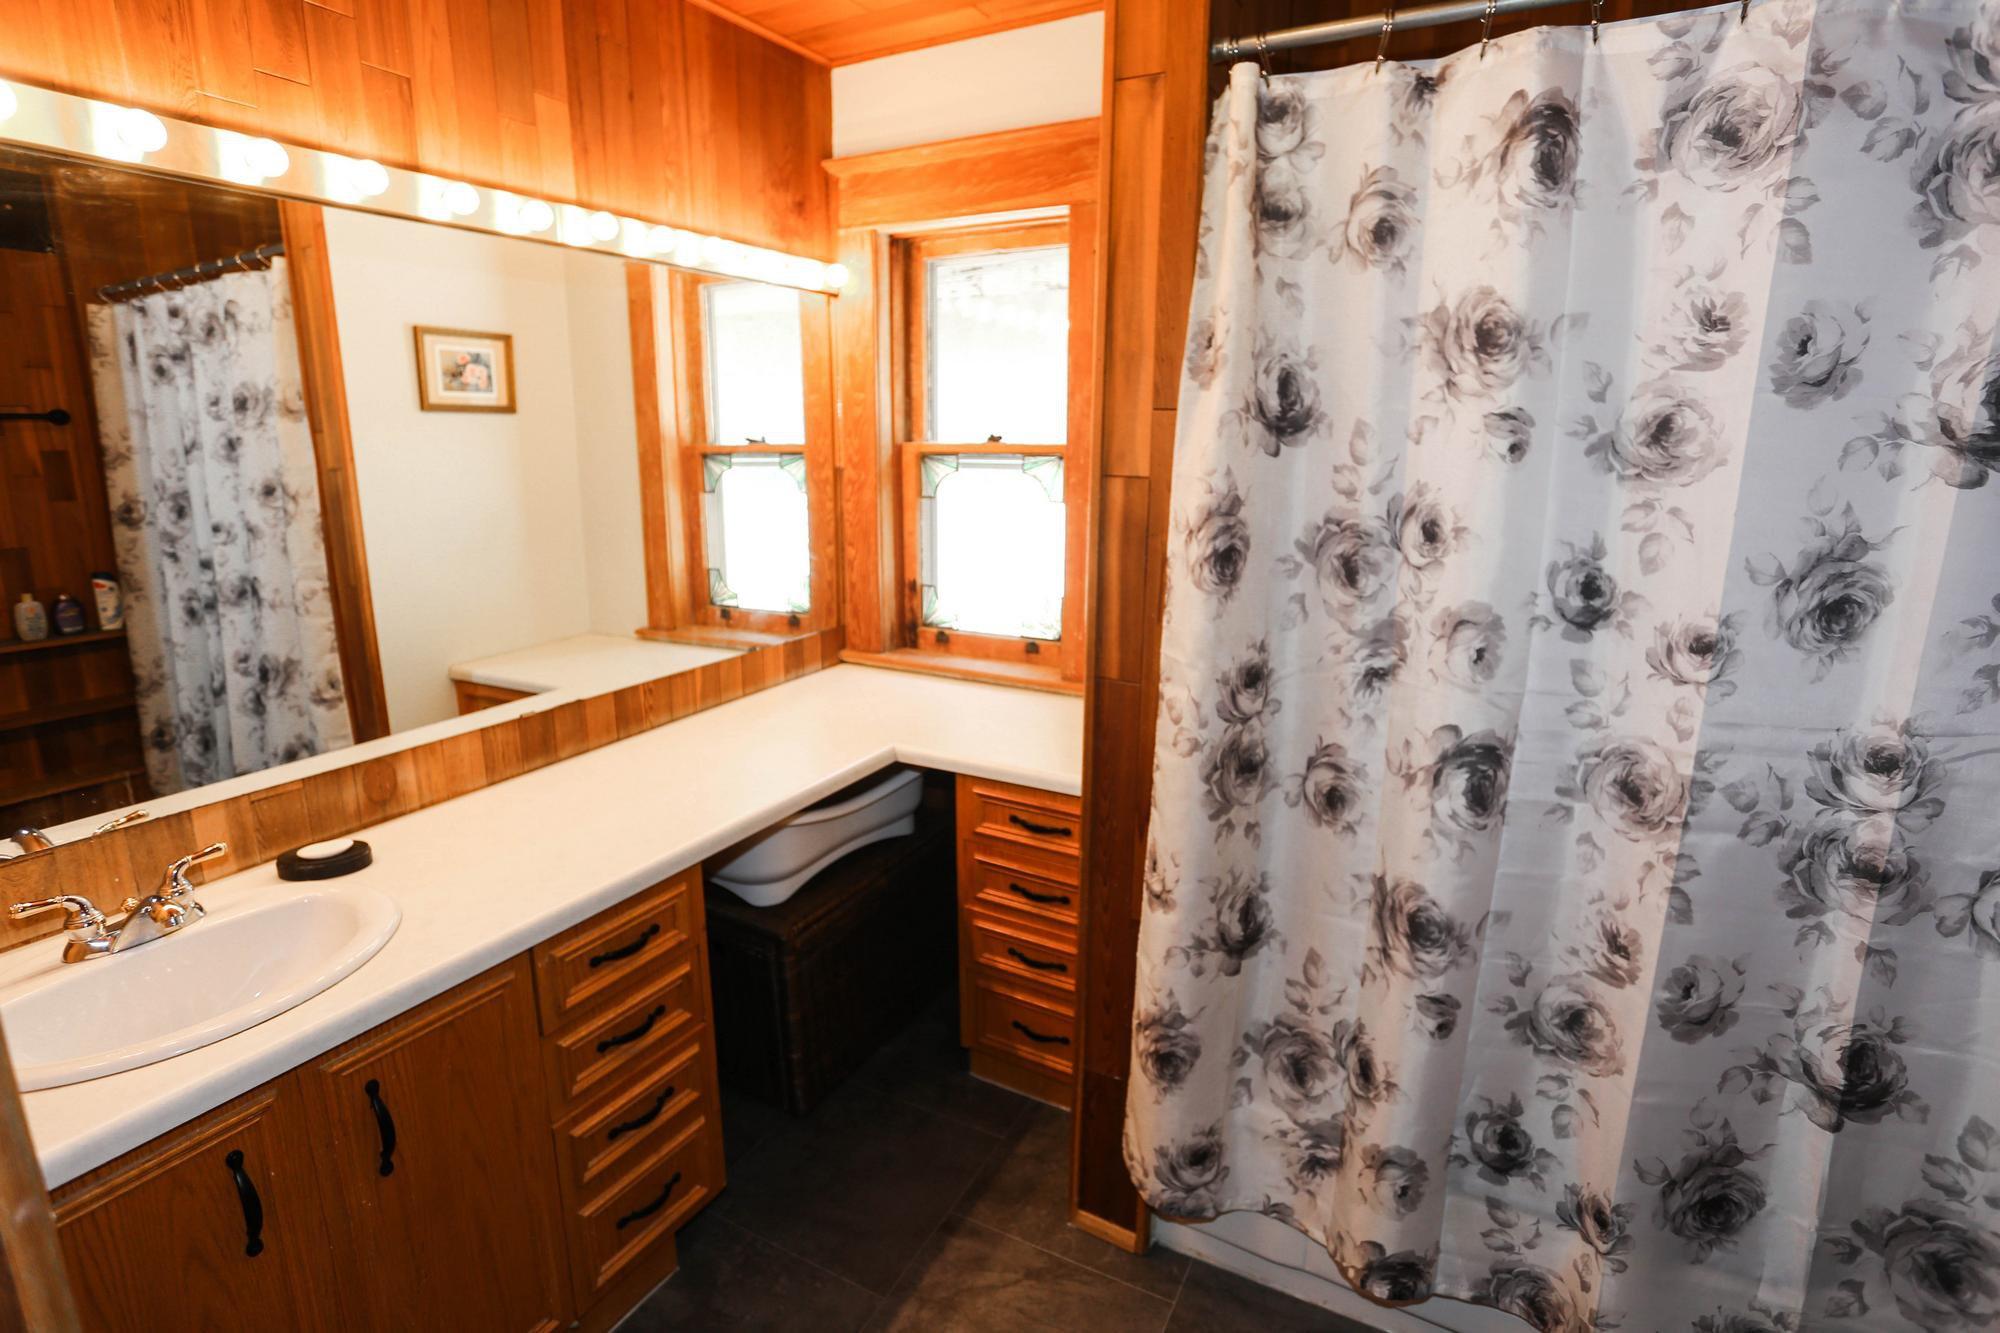 Photo 20: Photos: 105 Evanson Street in Winnipeg: Wolseley Single Family Detached for sale (5B)  : MLS®# 1821900